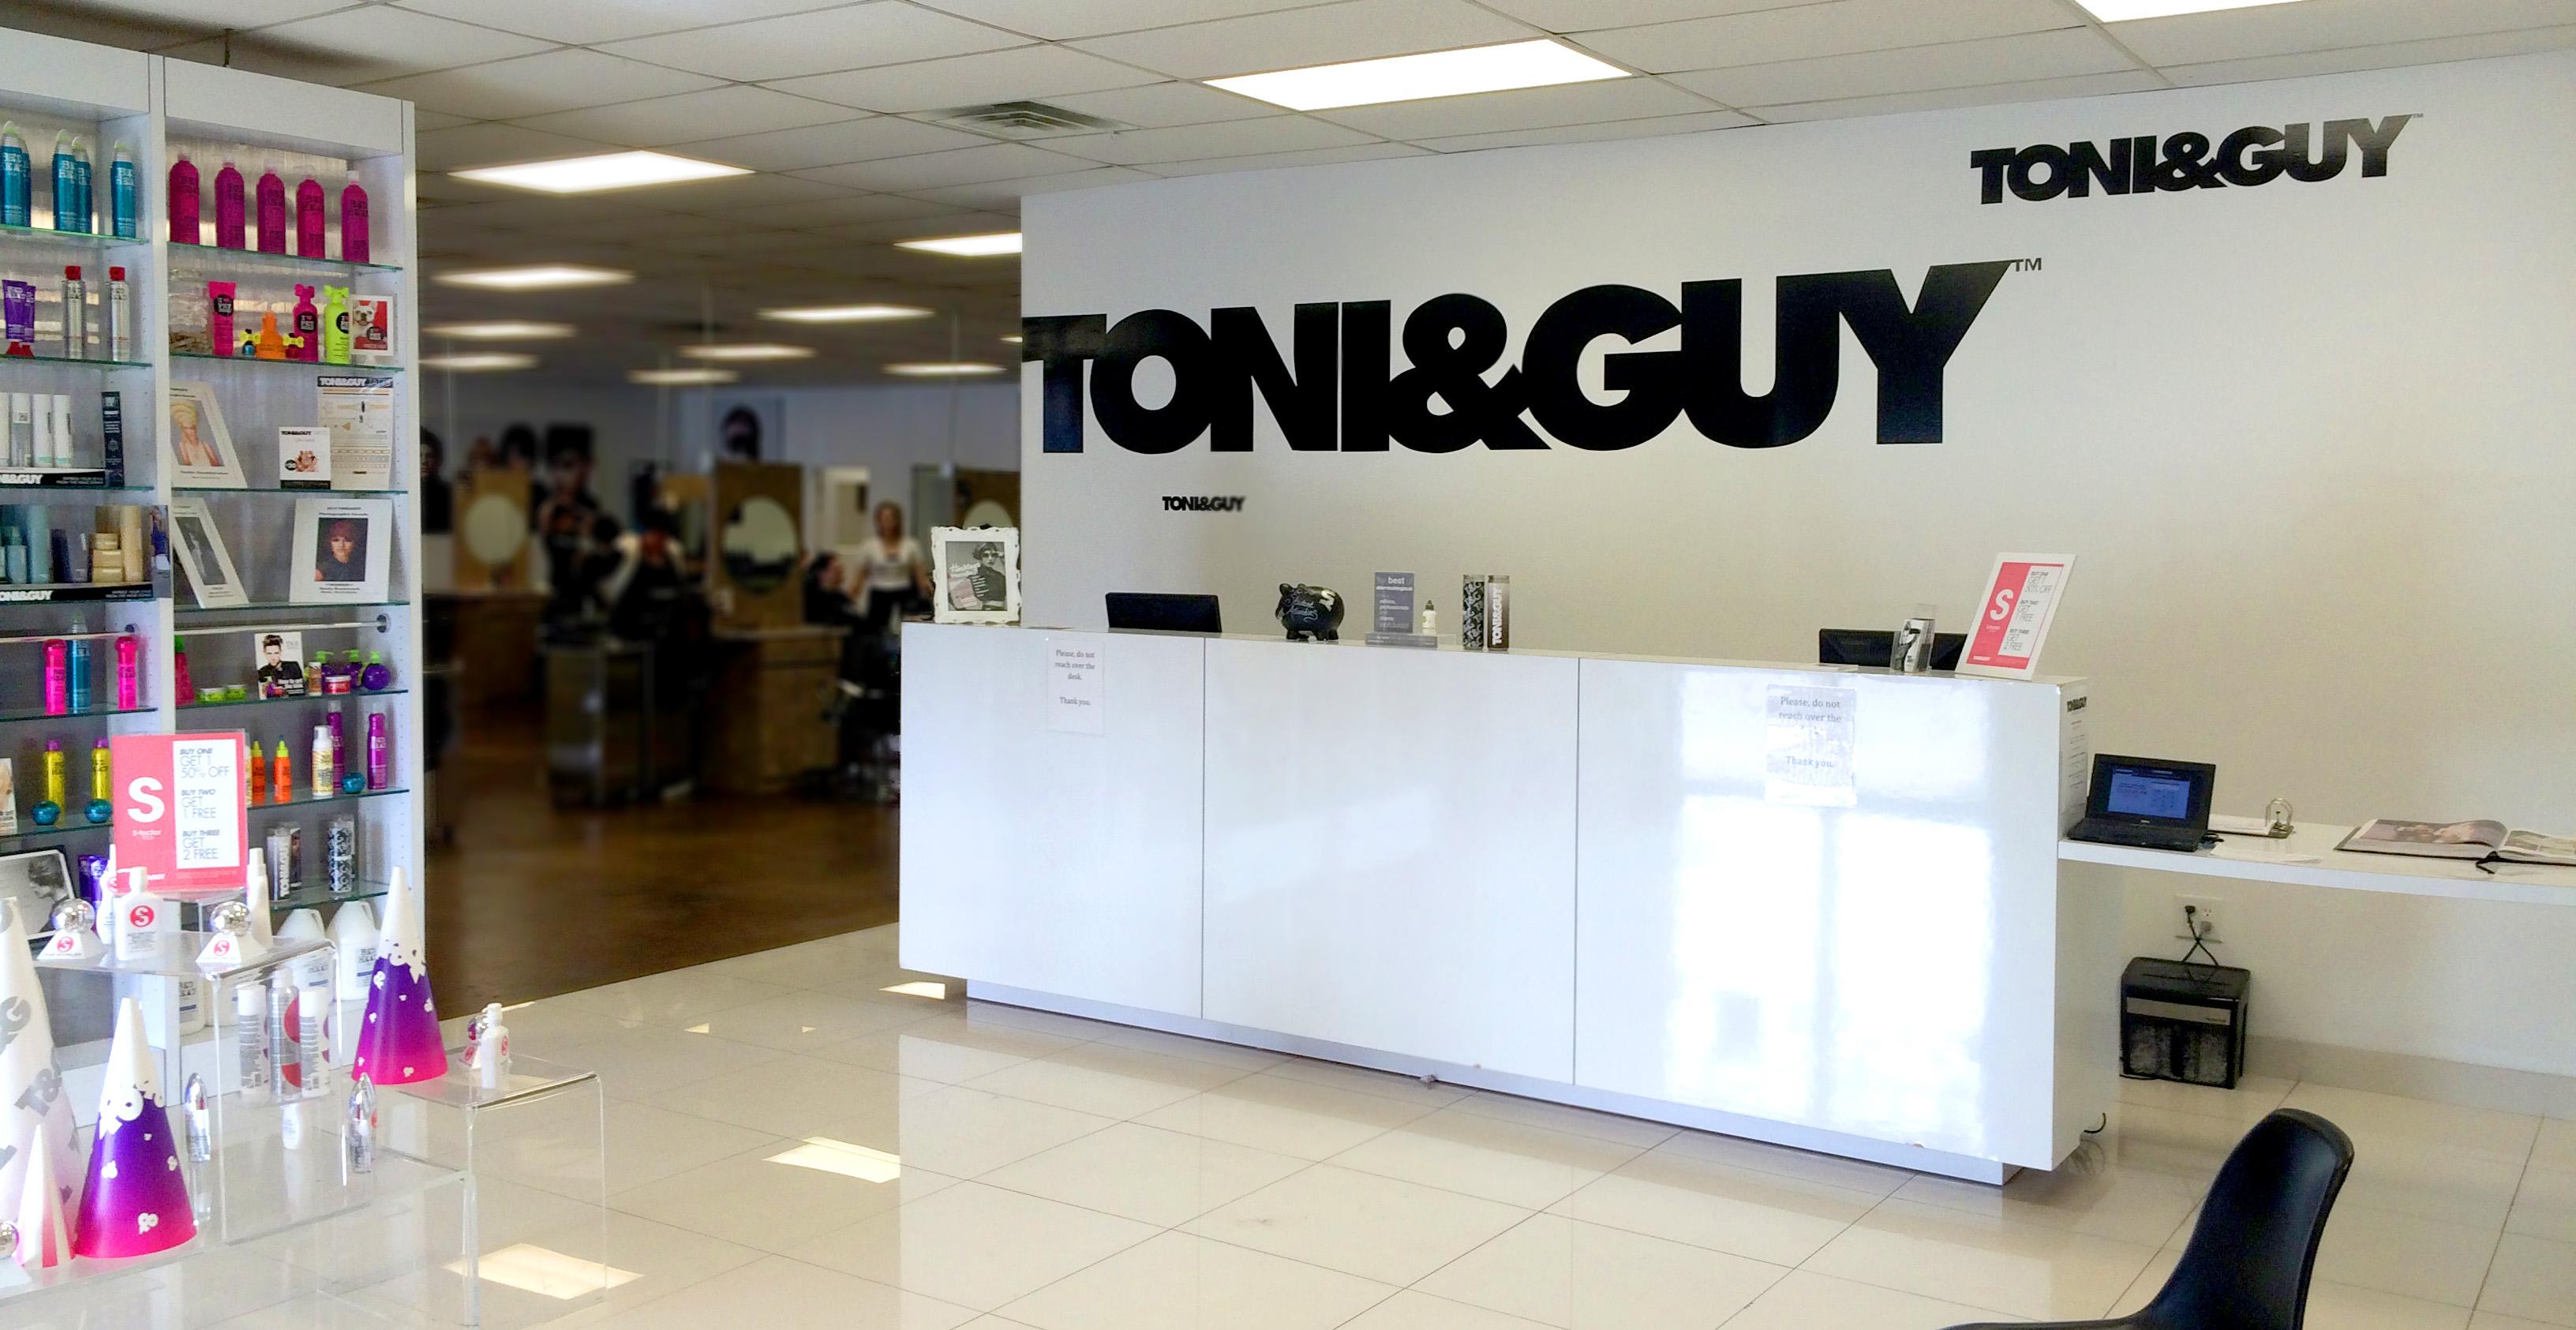 Toniguy Hairdressing Academy 1355 Roswell Rd Ste 150 Marietta Ga